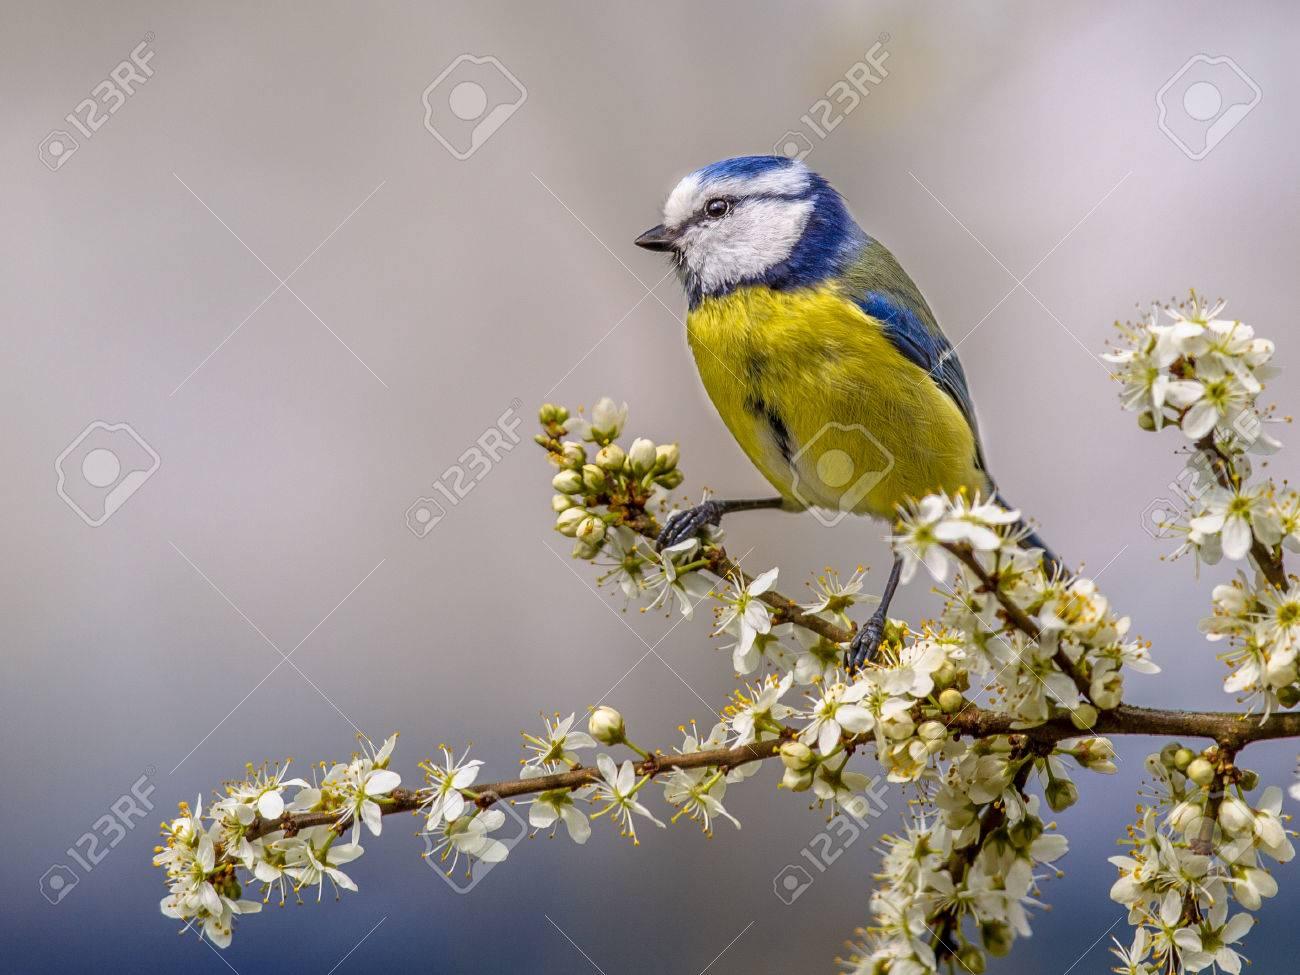 Blue tit (Parus caeruleus) perched on branch of Hawthorn (Crataegus monogyna) with white blossom - 73420658